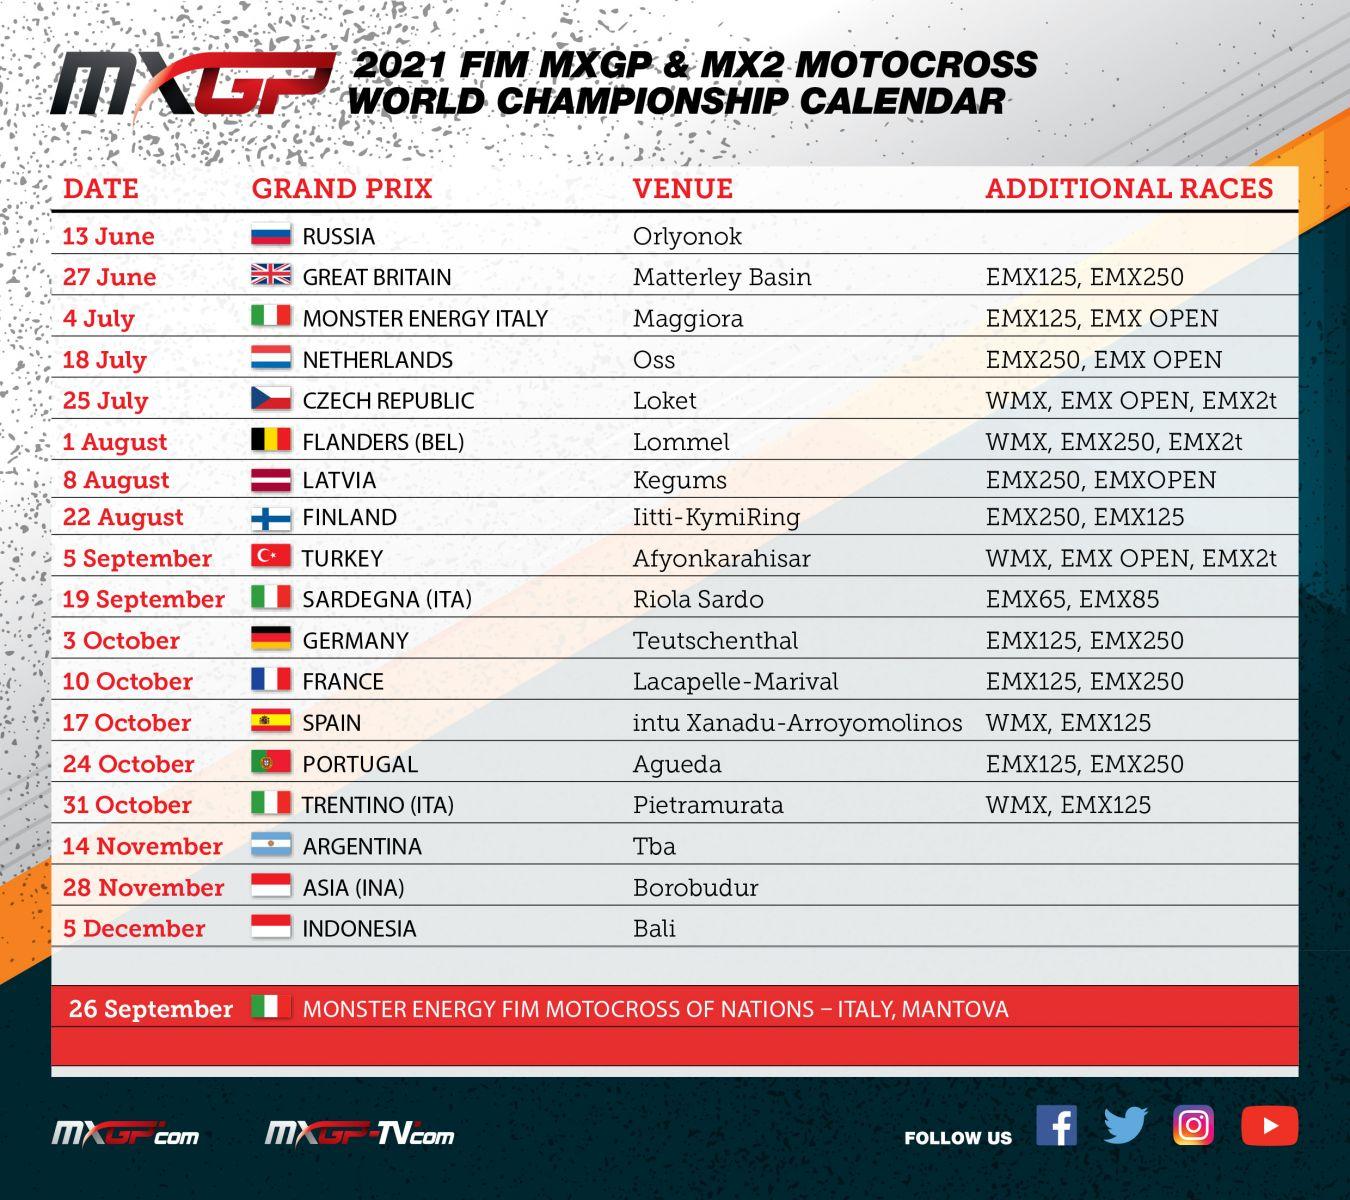 Calendar Update: 2021 Fim Motocross World Championship